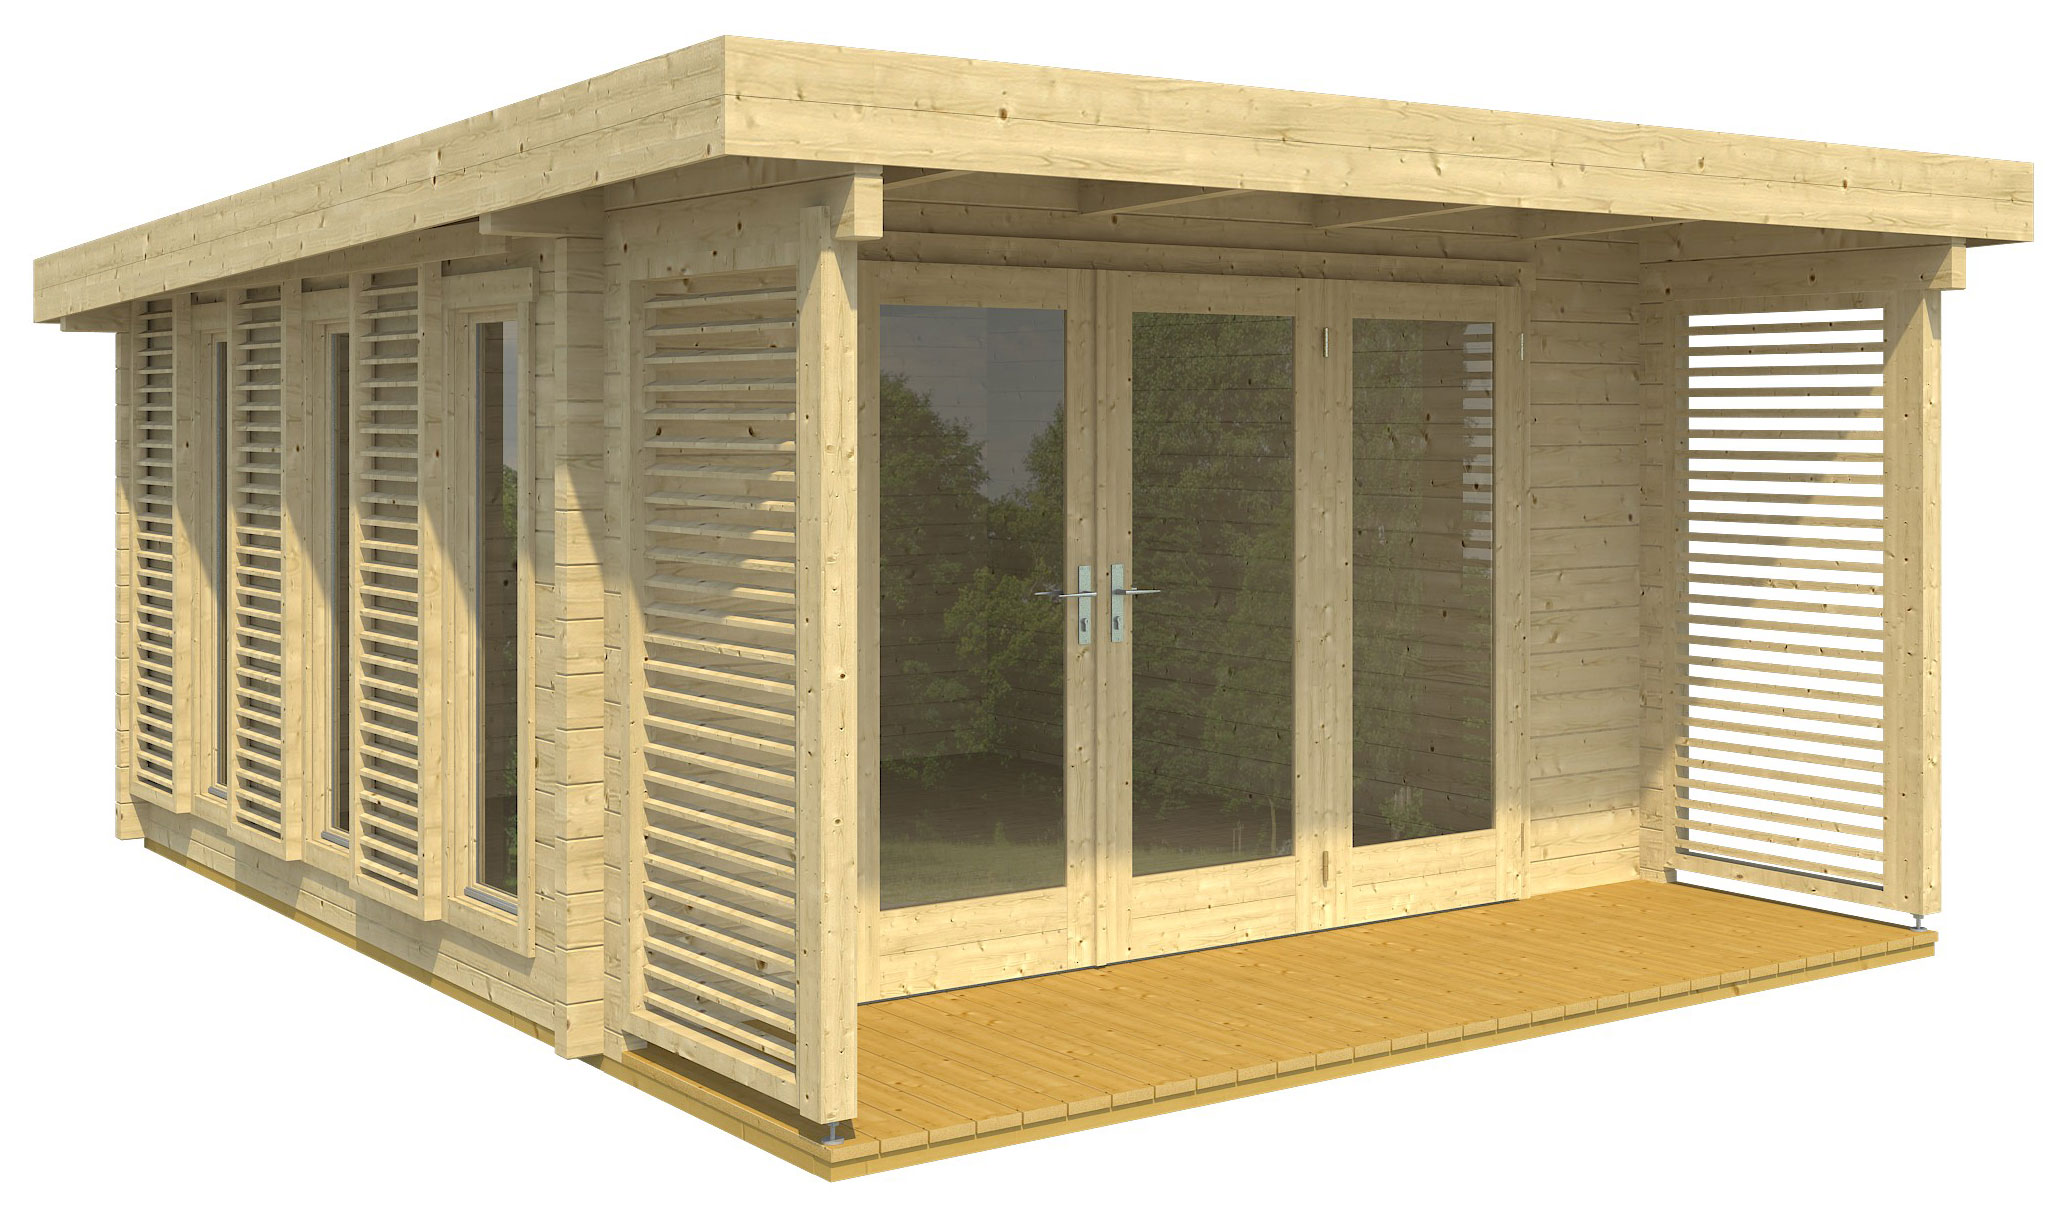 gartenhaus exeter 2 online g nstig kaufen. Black Bedroom Furniture Sets. Home Design Ideas